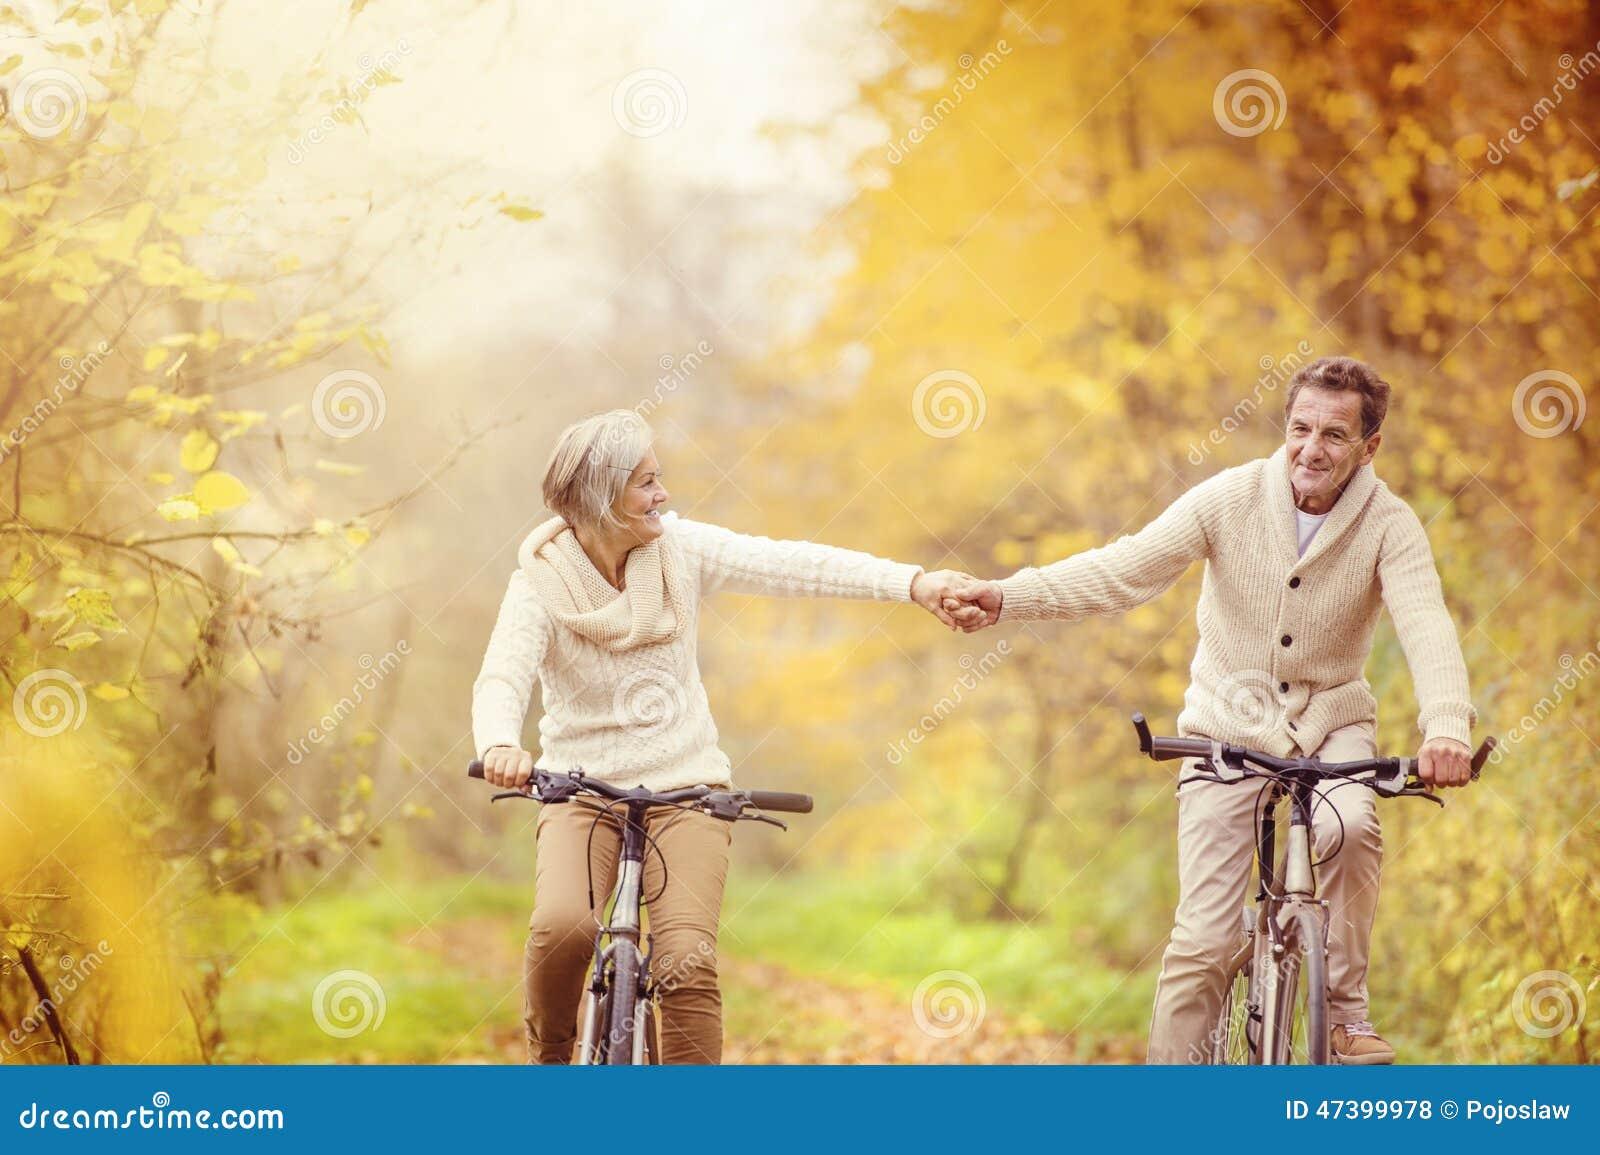 Active seniors riding bike